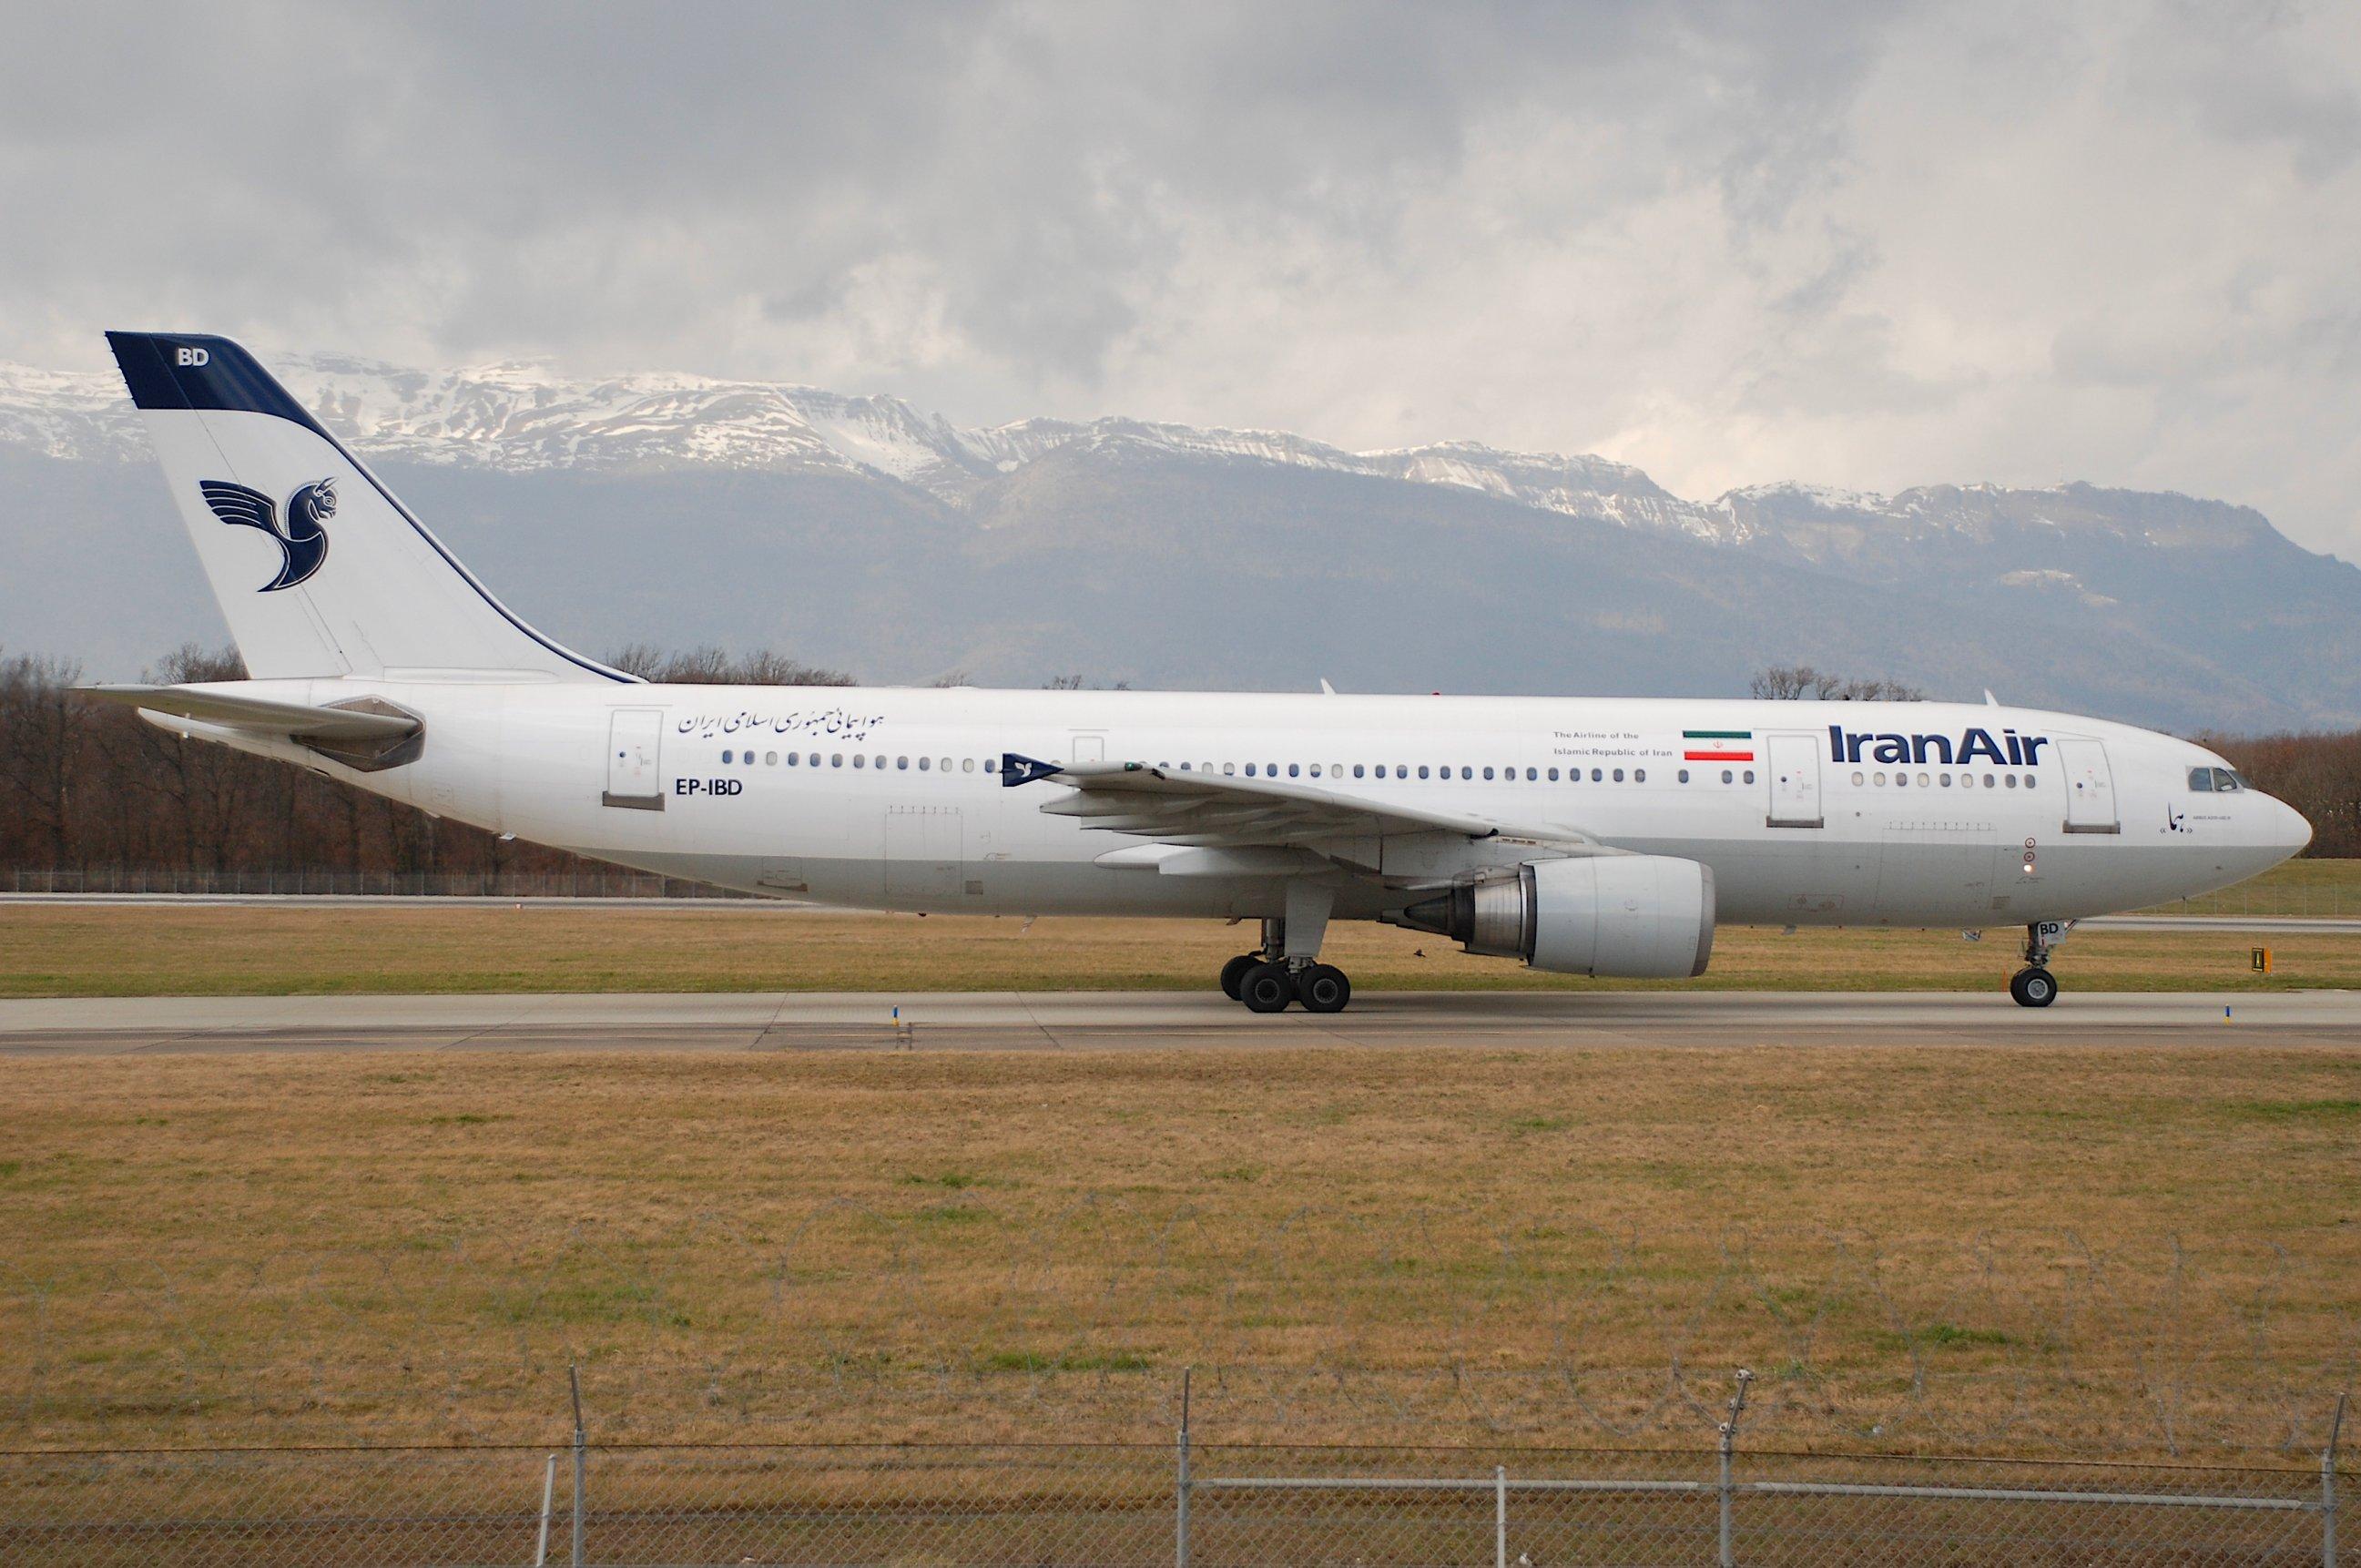 iran_air_airbus_a300-605r_ep-ibdgva24-02-2007-451eg_-_flickr_-_aero_icarus